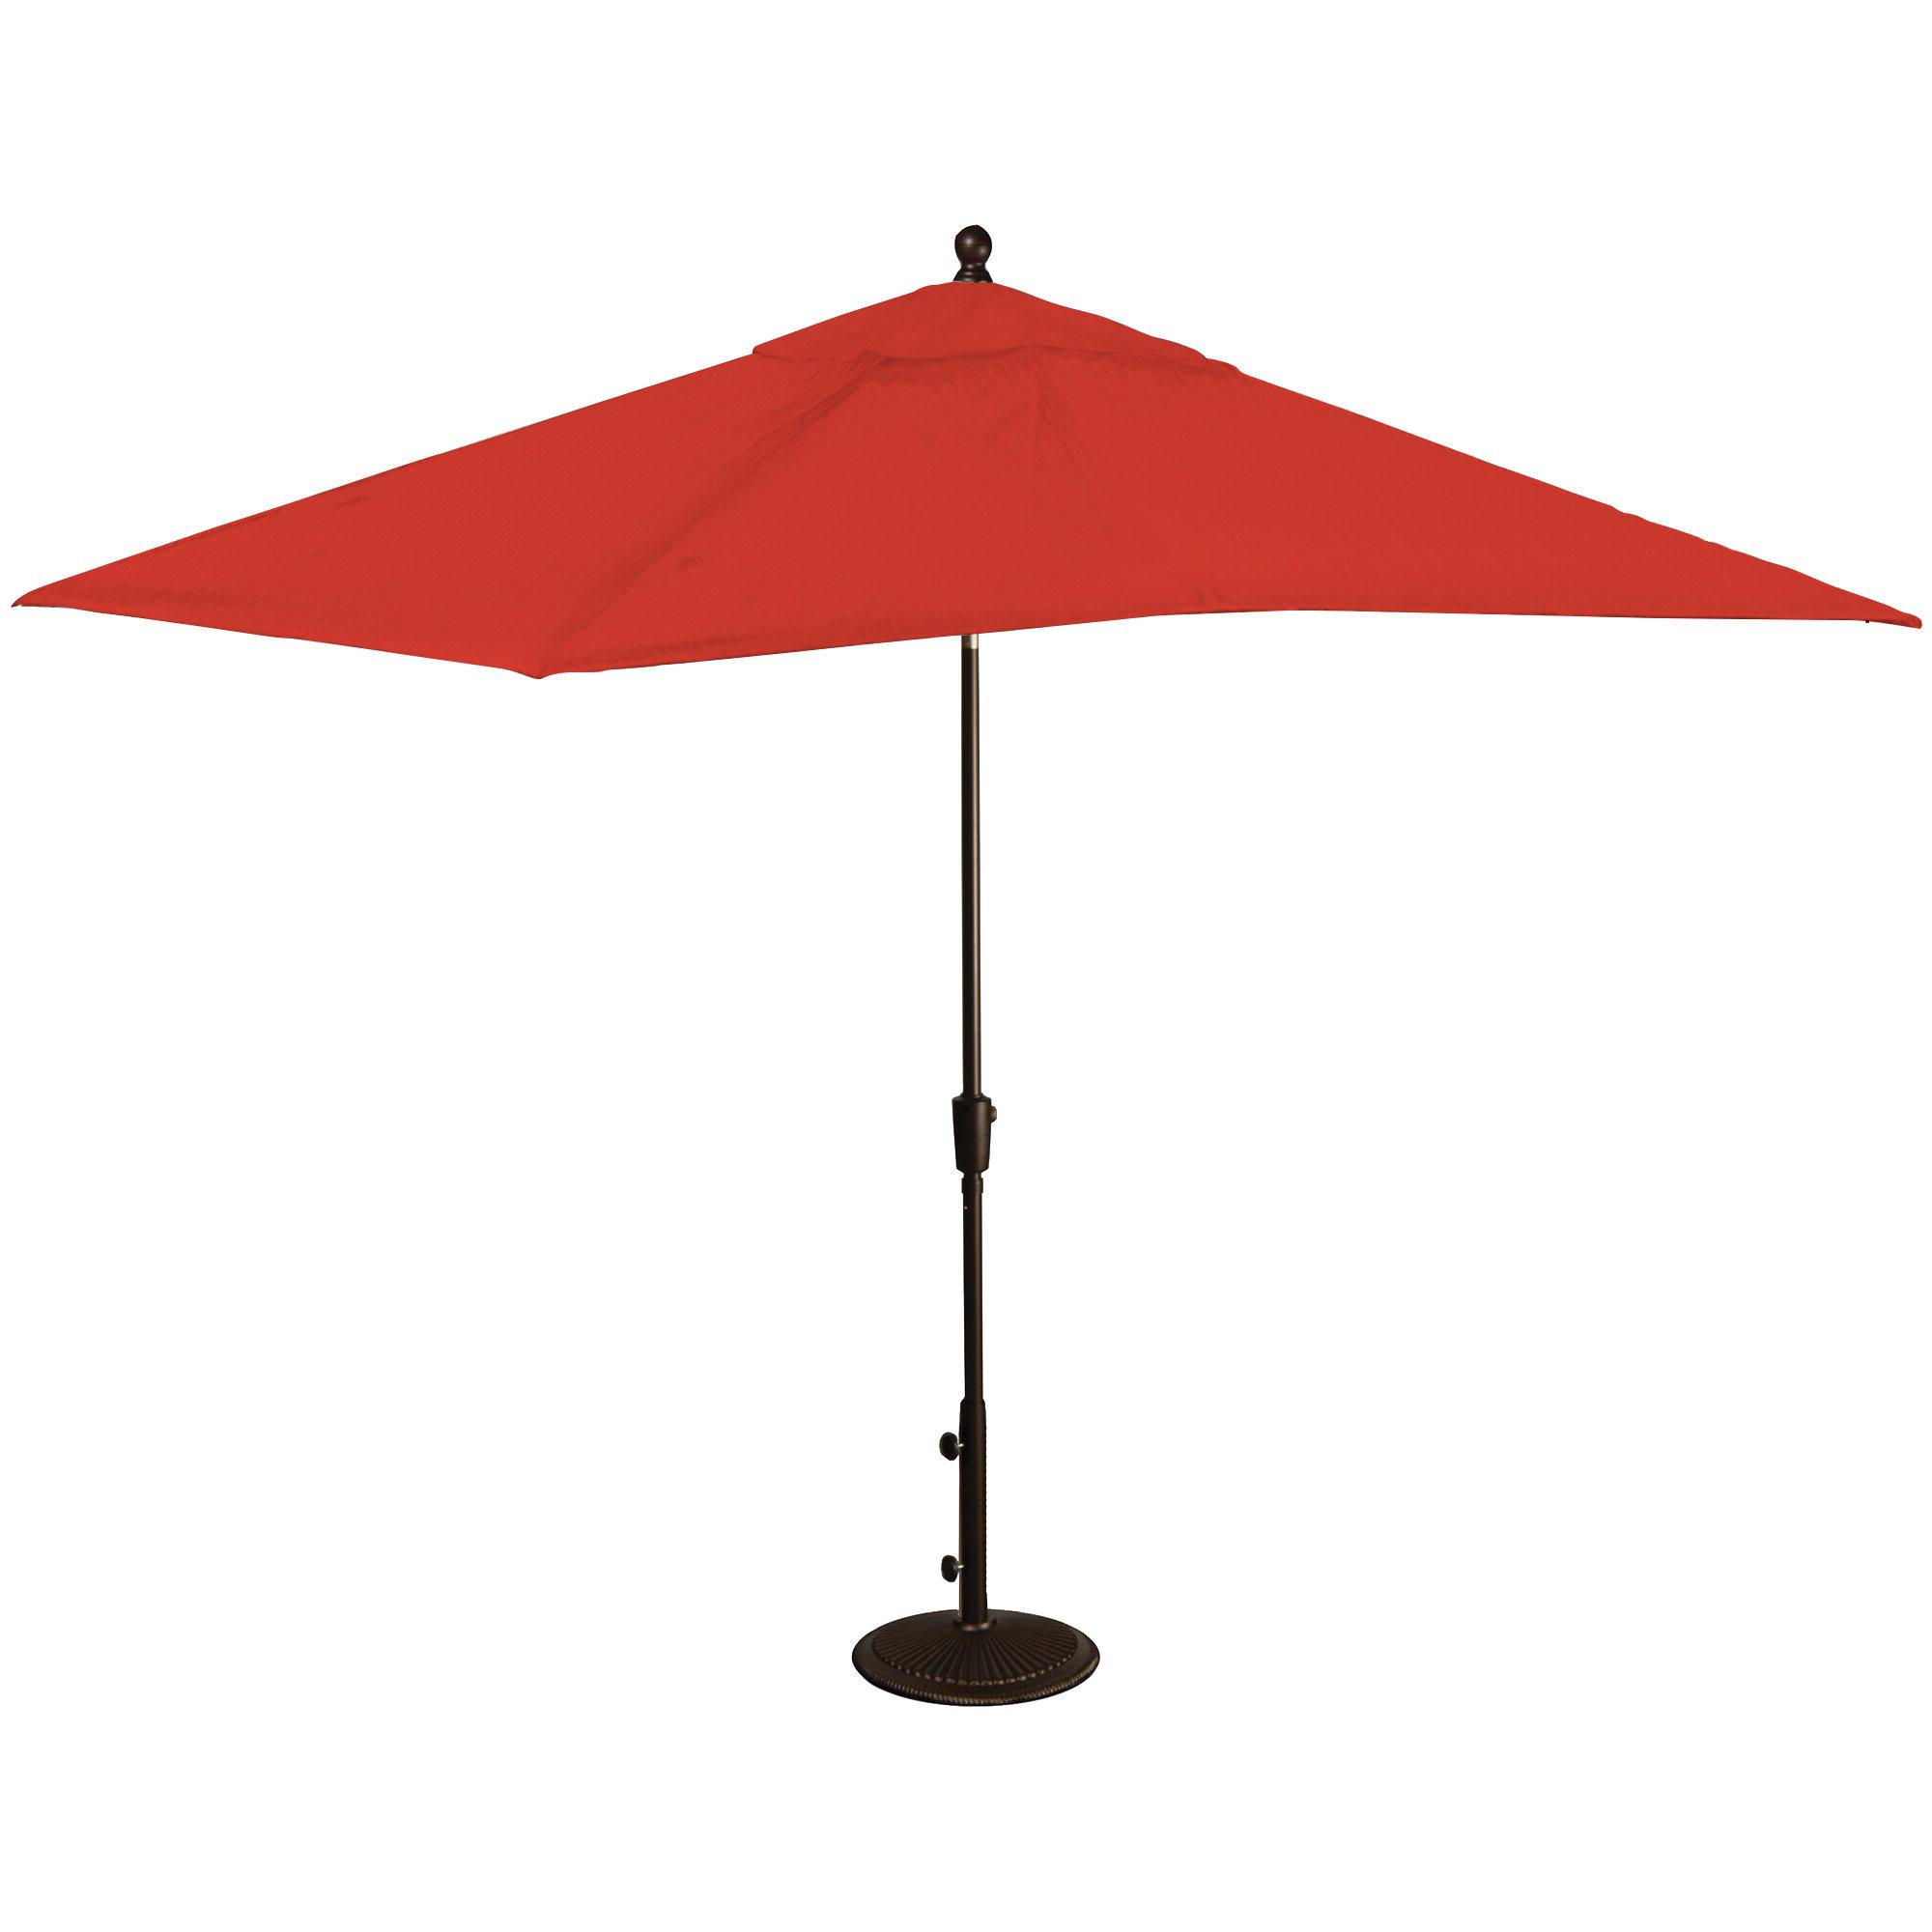 Maglione Fabric 4Cantilever Umbrellas In Popular Caspian 8' X 10' Rectangular Market Umbrella (Gallery 4 of 20)